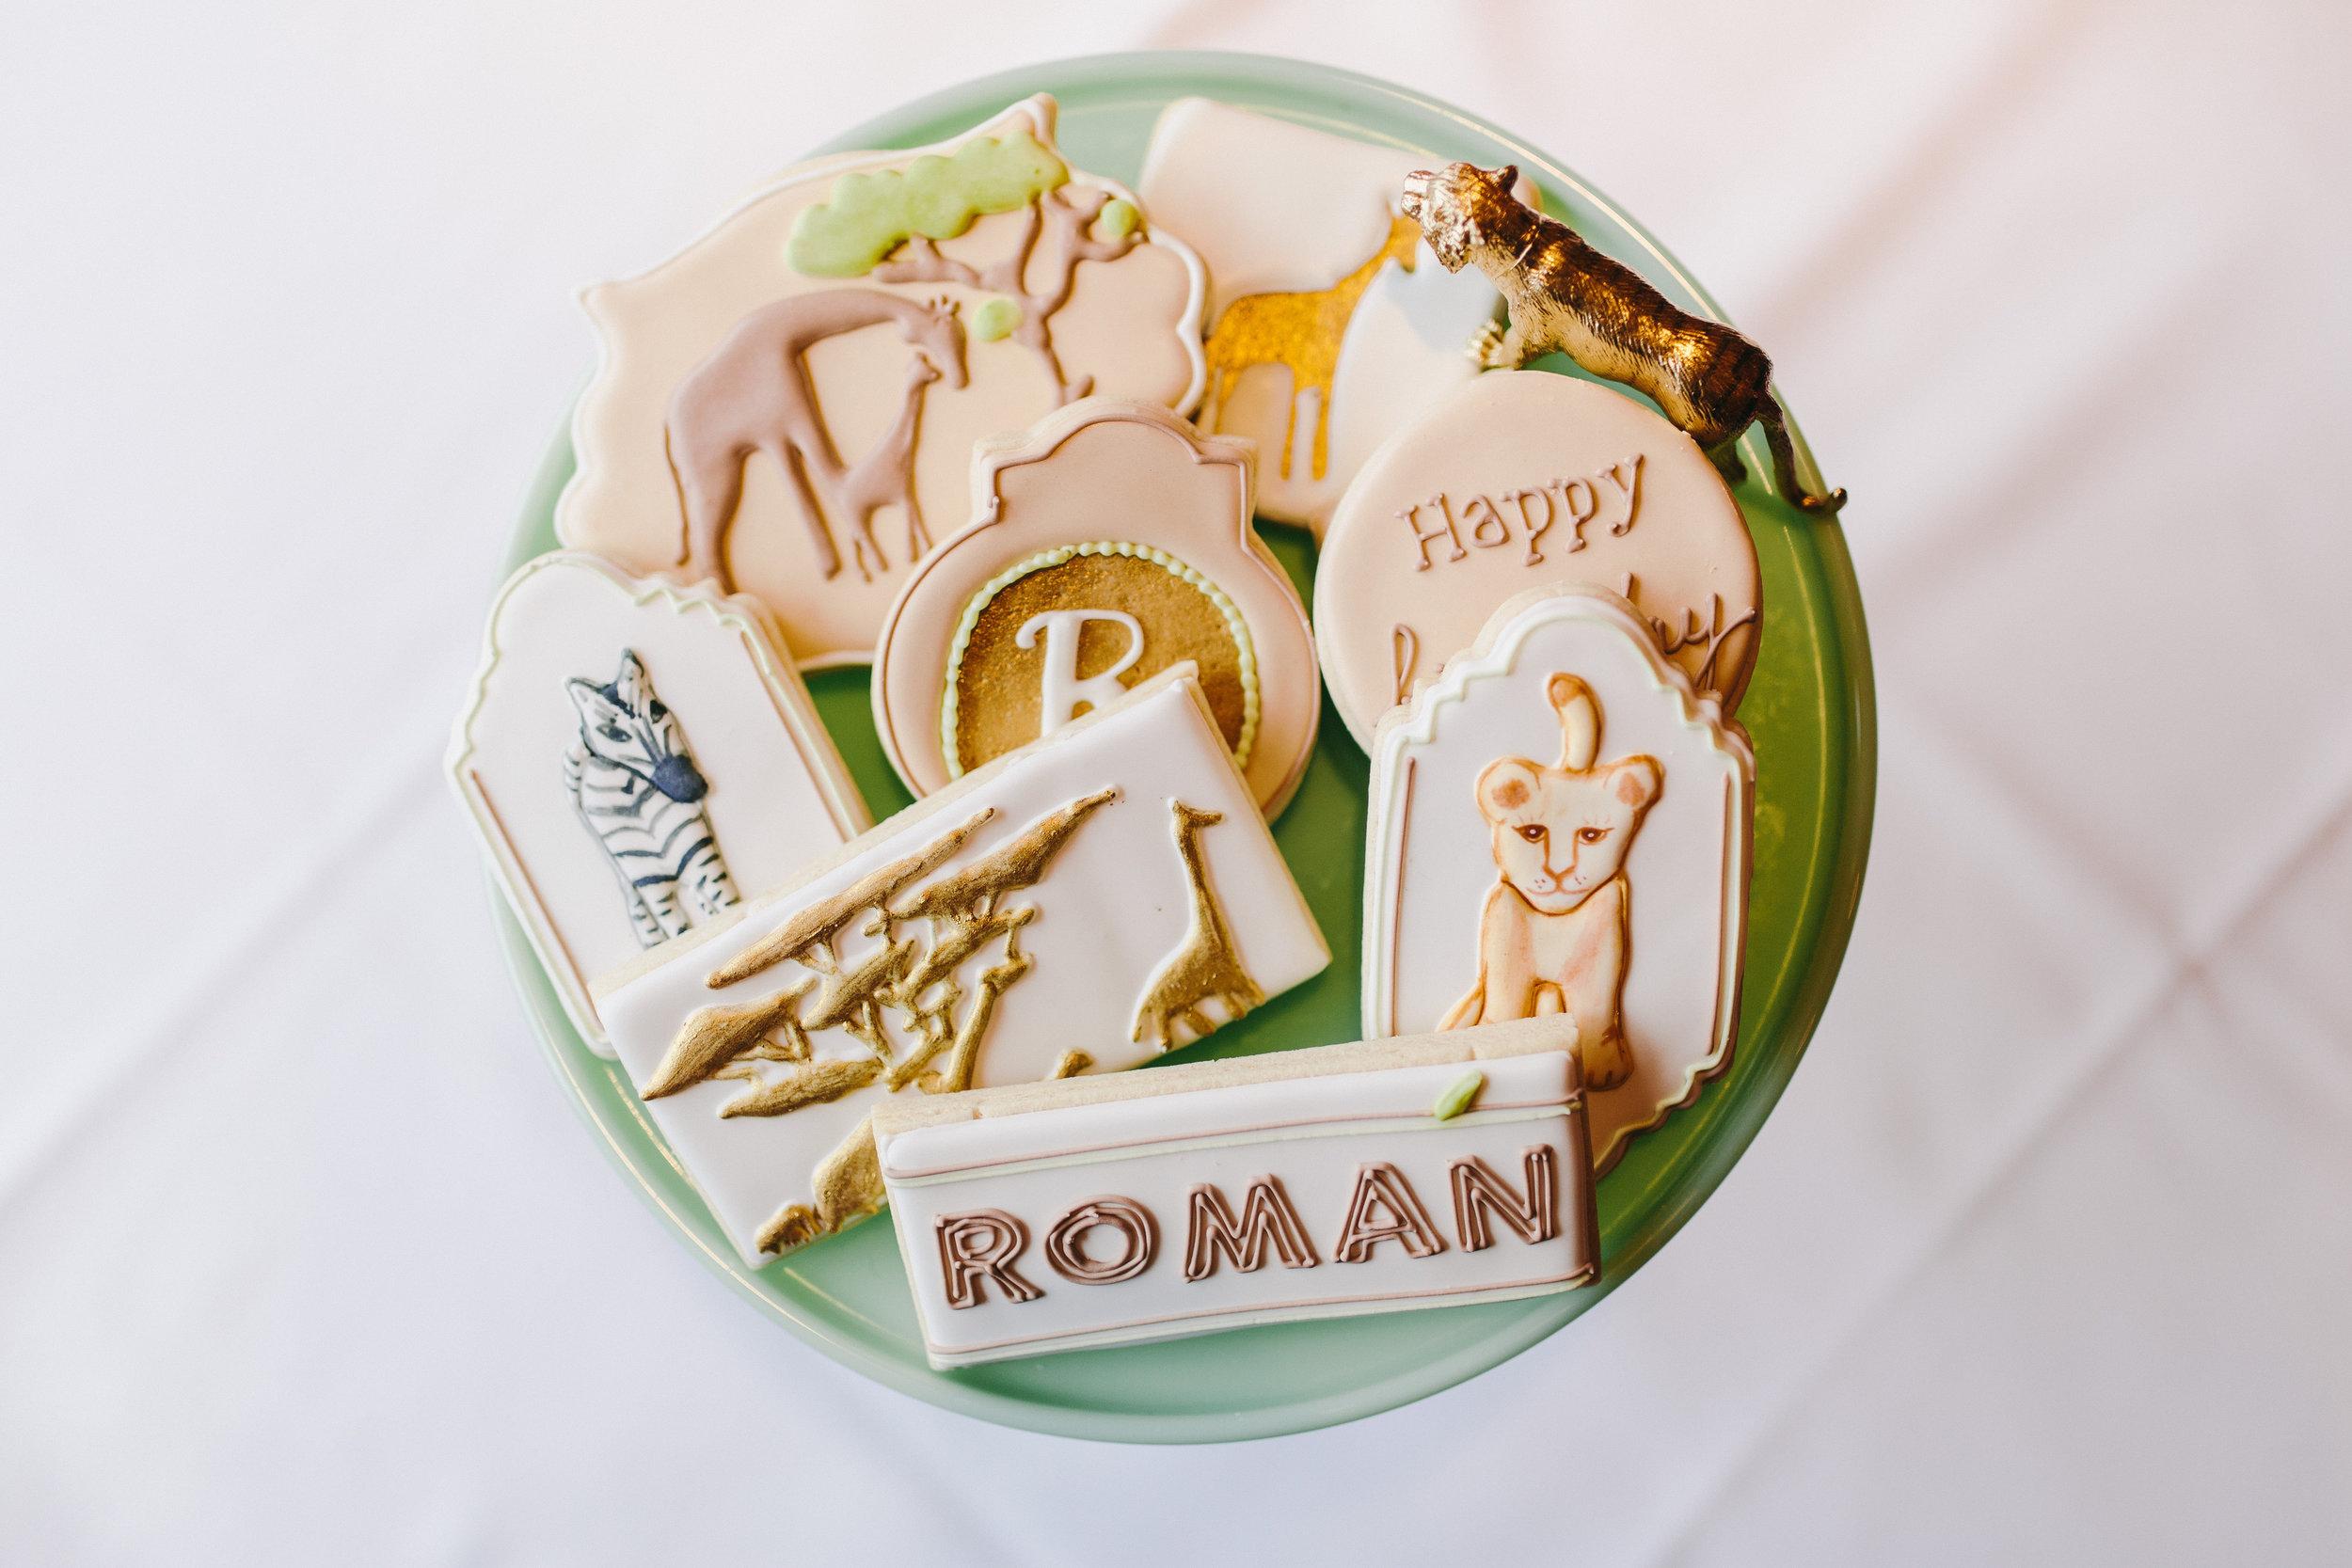 Roman s First Birthday-Roman Party-0002.jpg